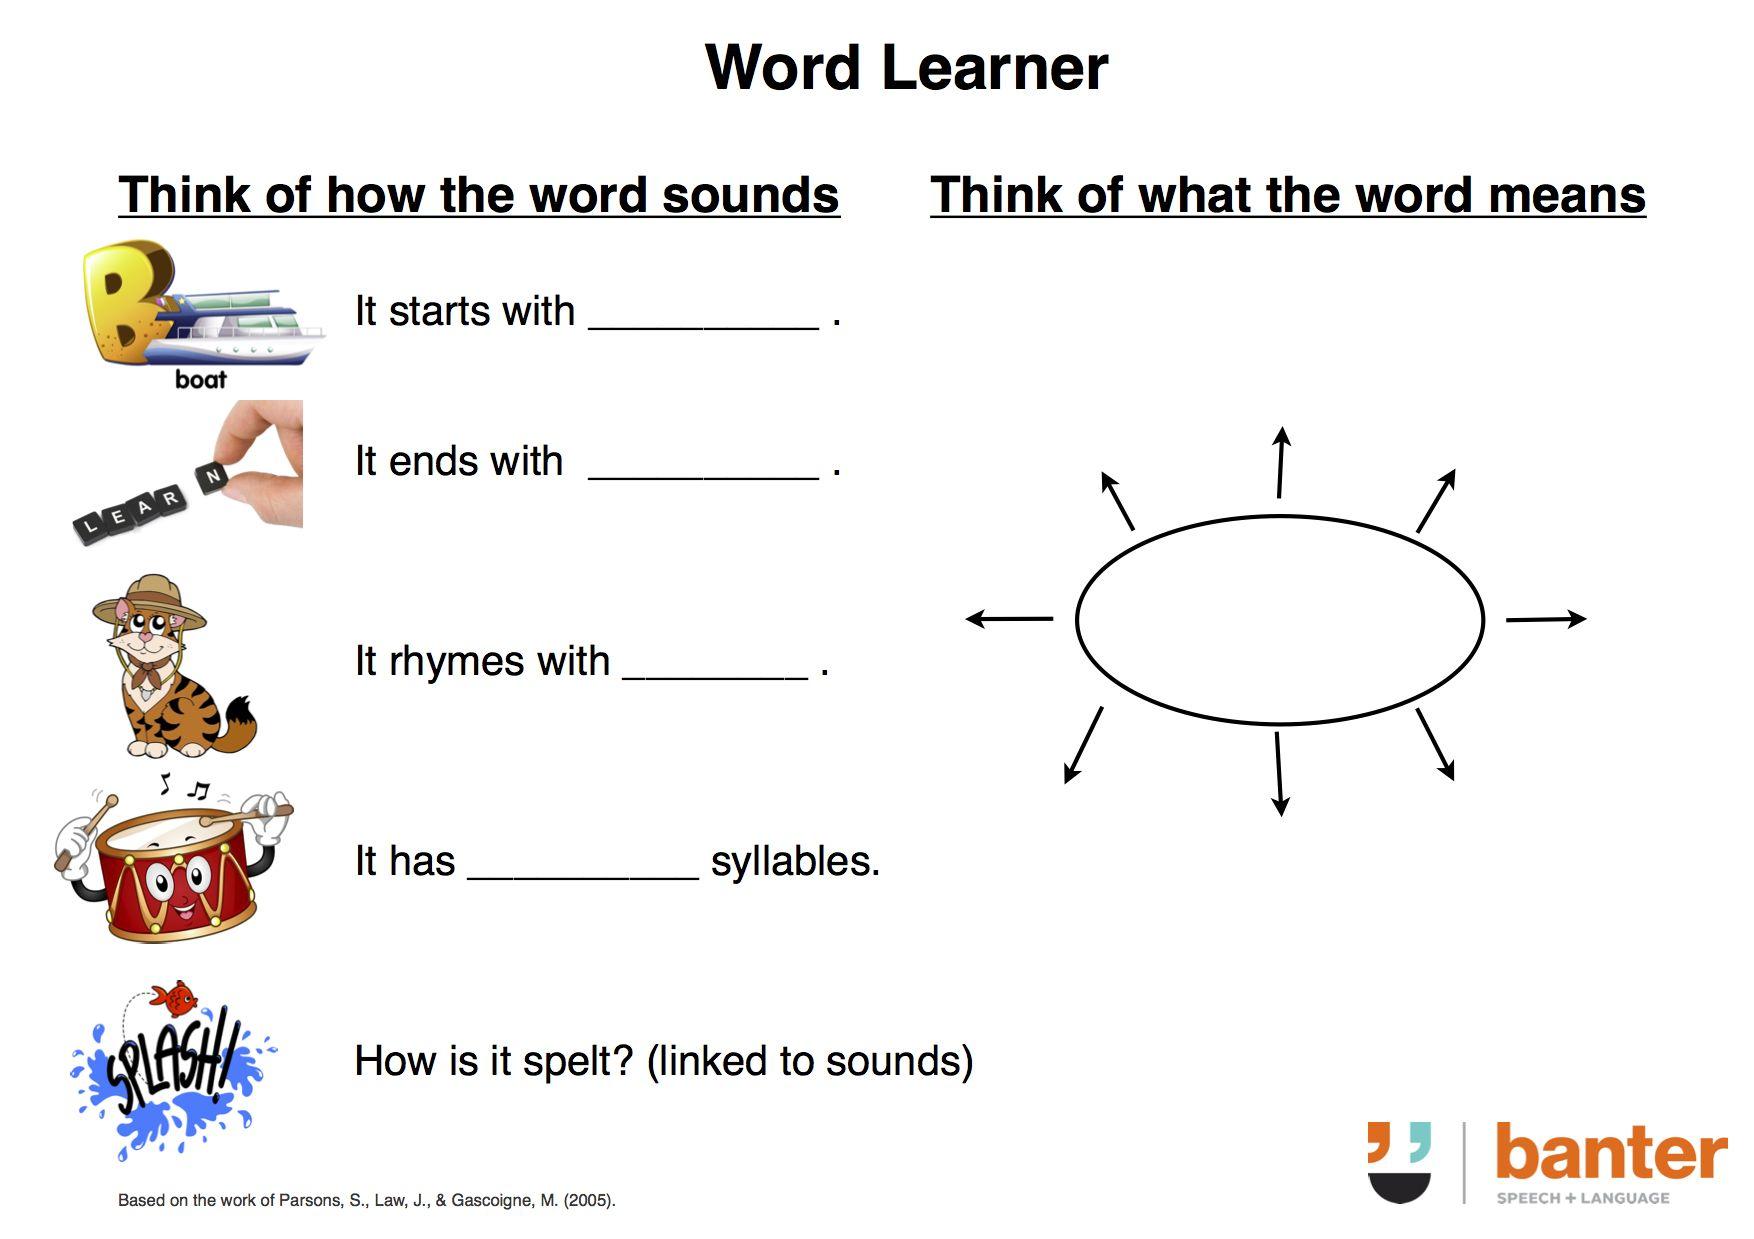 Slp An Evidence Based Free Worksheet To Help Children